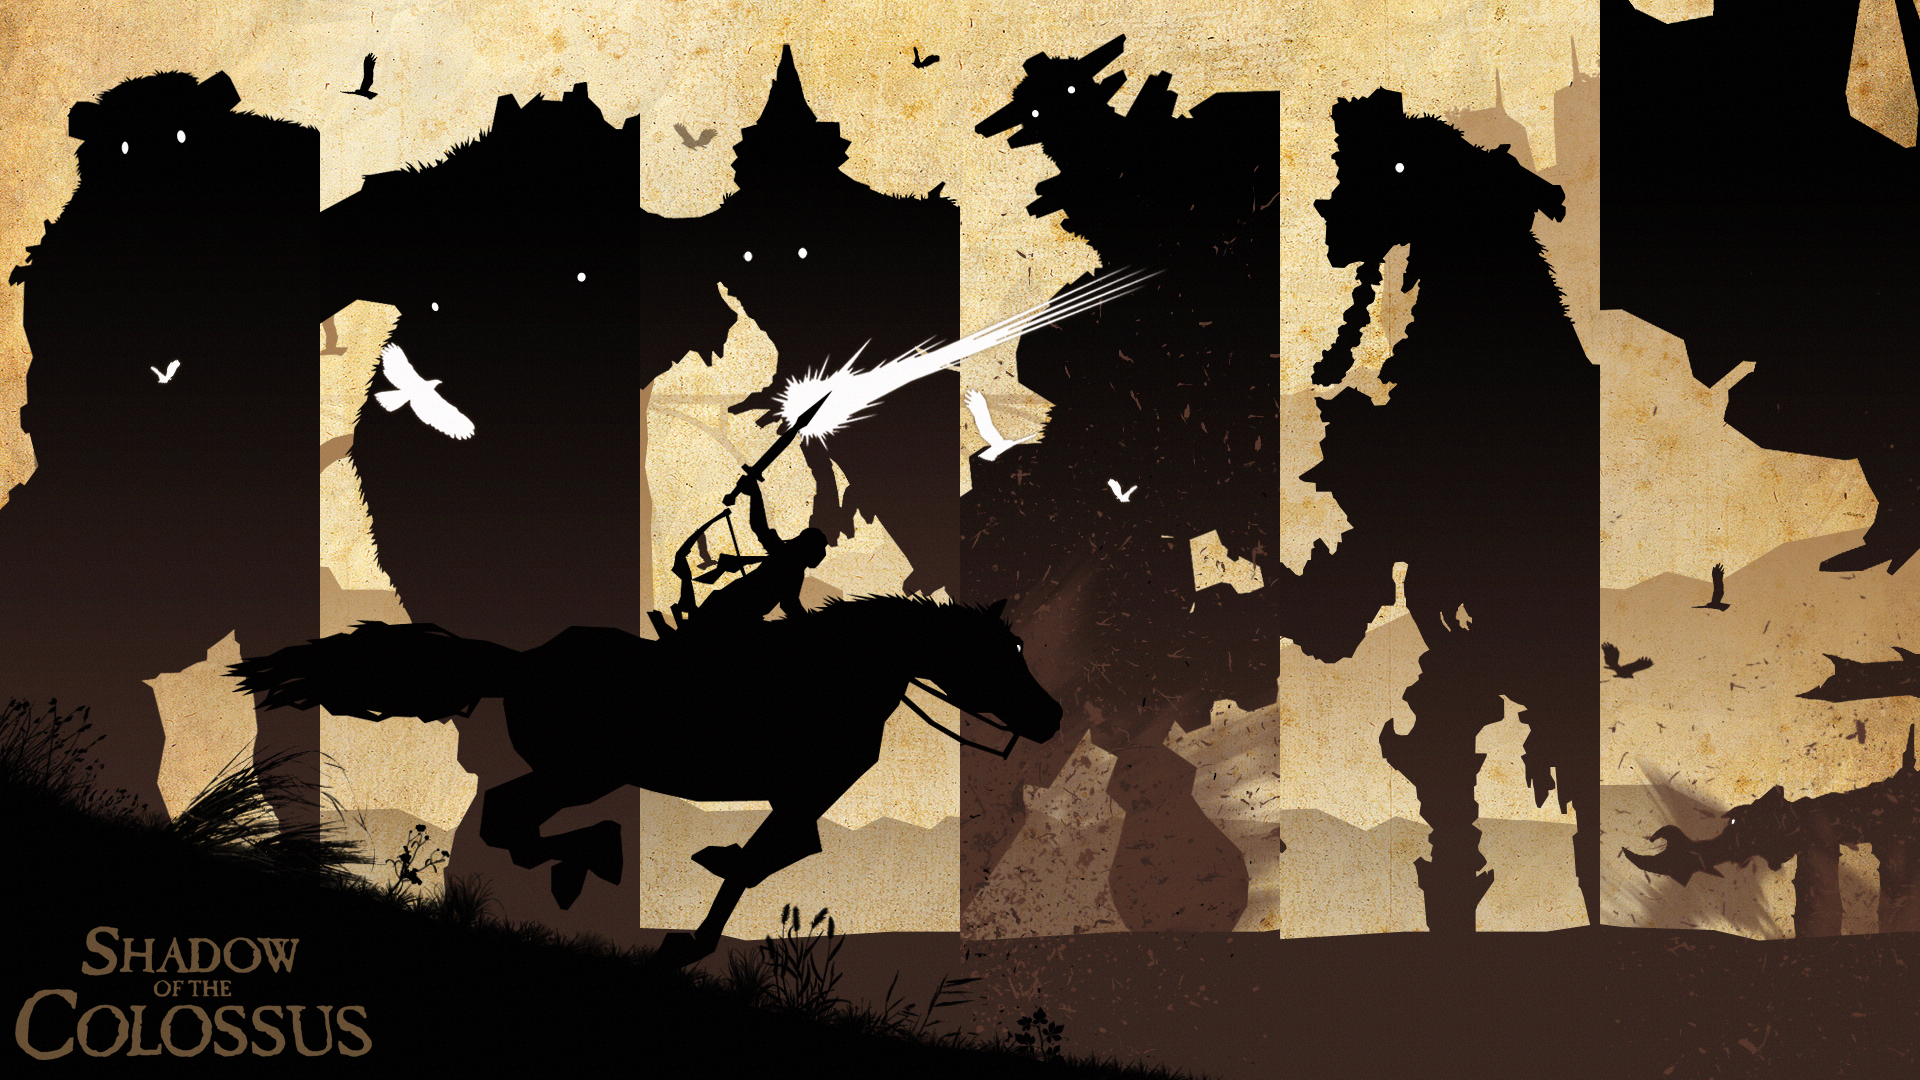 Shadow of the Colossus Wallpaper - WallpaperSafari